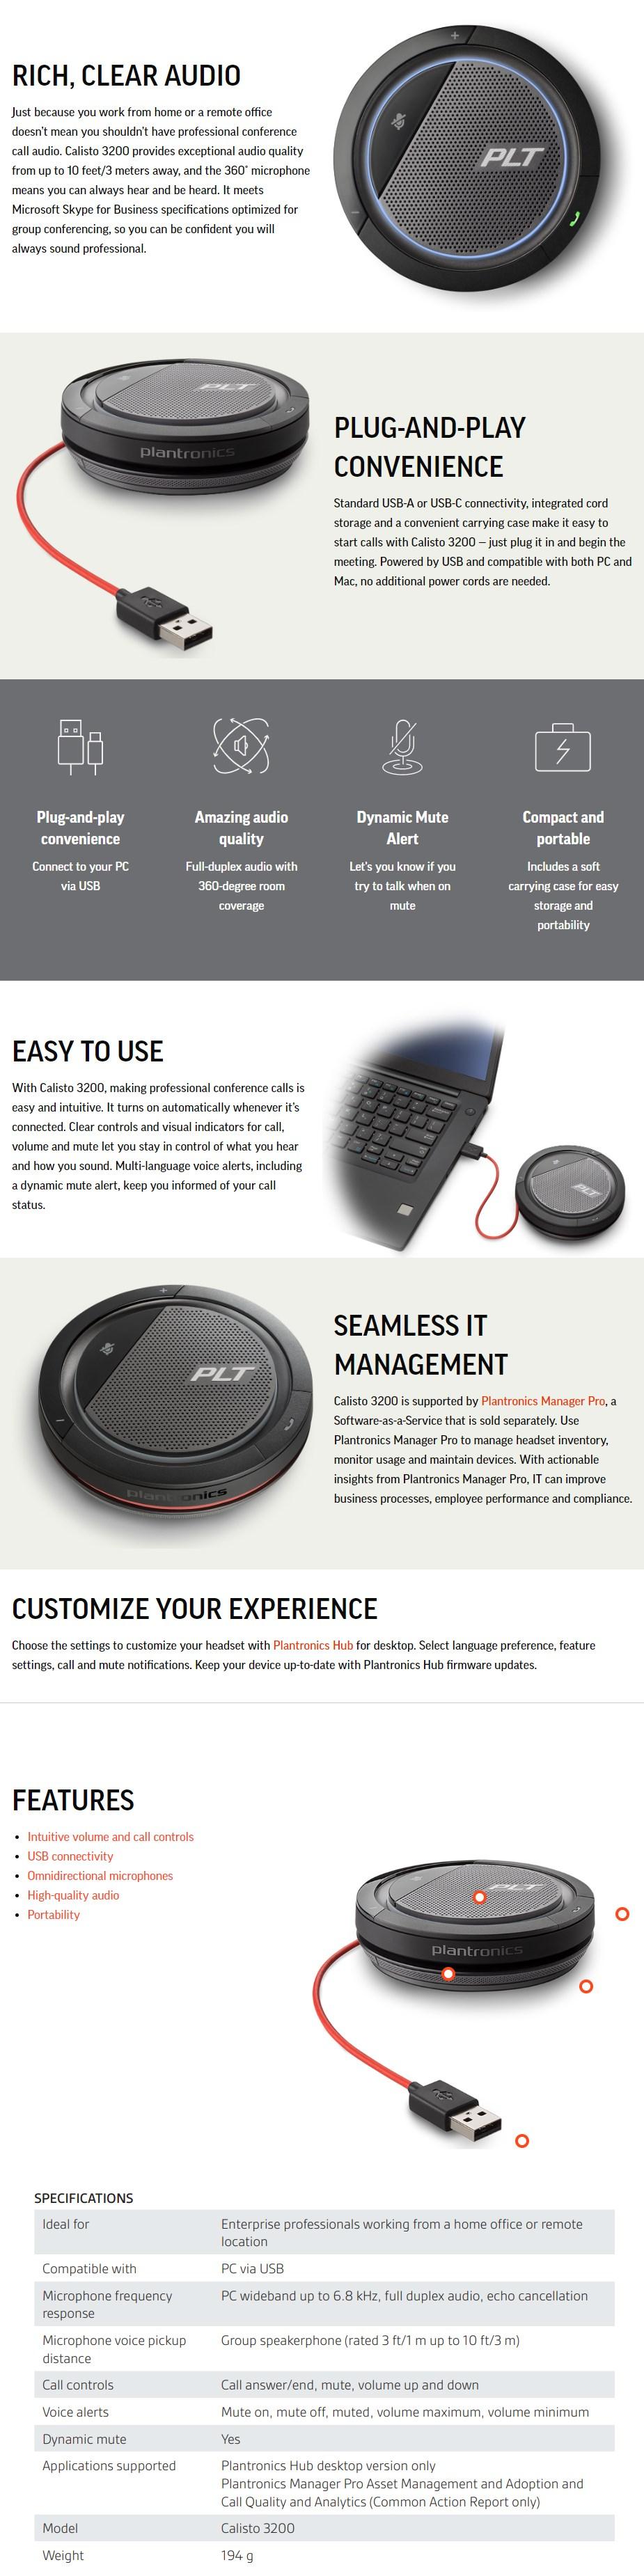 plantronics-calisto-3200-uca-usba-portable-speakerphone-ac27683-3.jpg